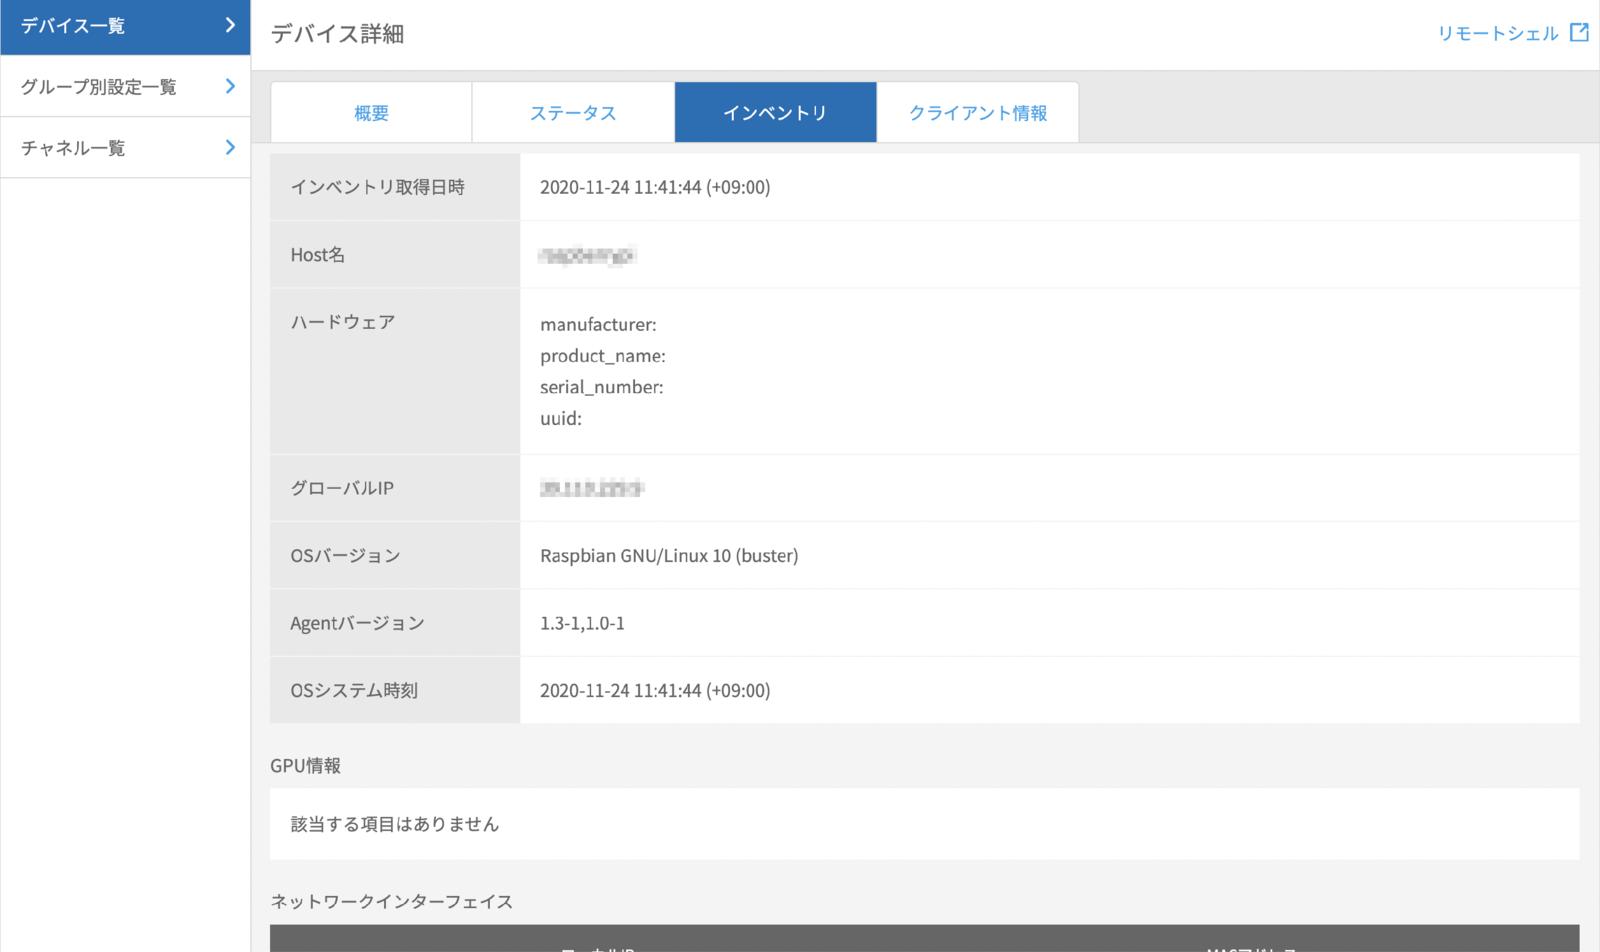 f:id:optim-tech:20201125113917p:plain